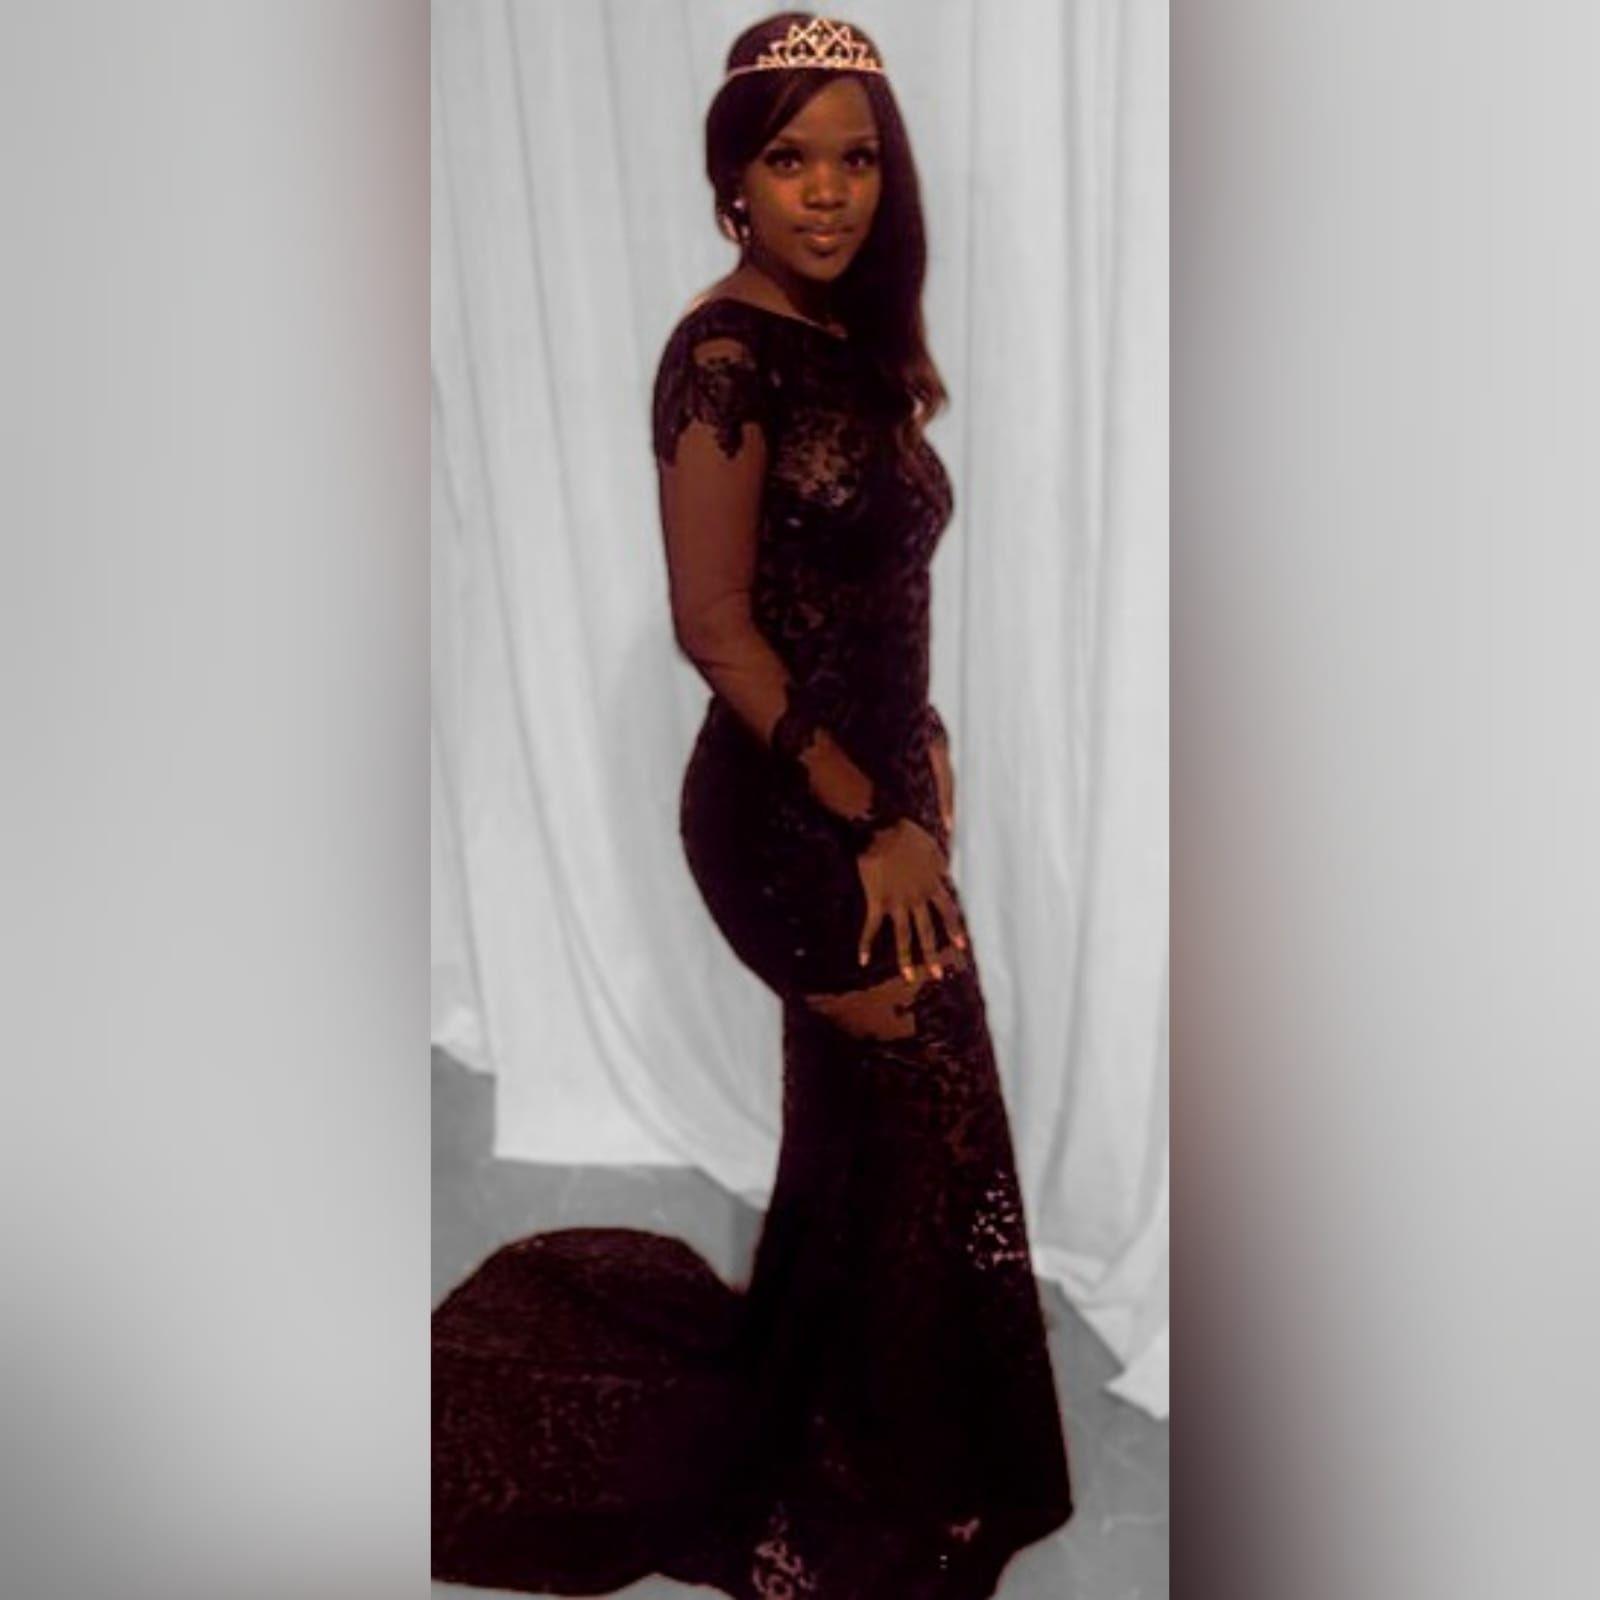 21st Birthday Party Black Dress Dresses Black Party Dresses Formal Wear Dresses [ 1600 x 1600 Pixel ]